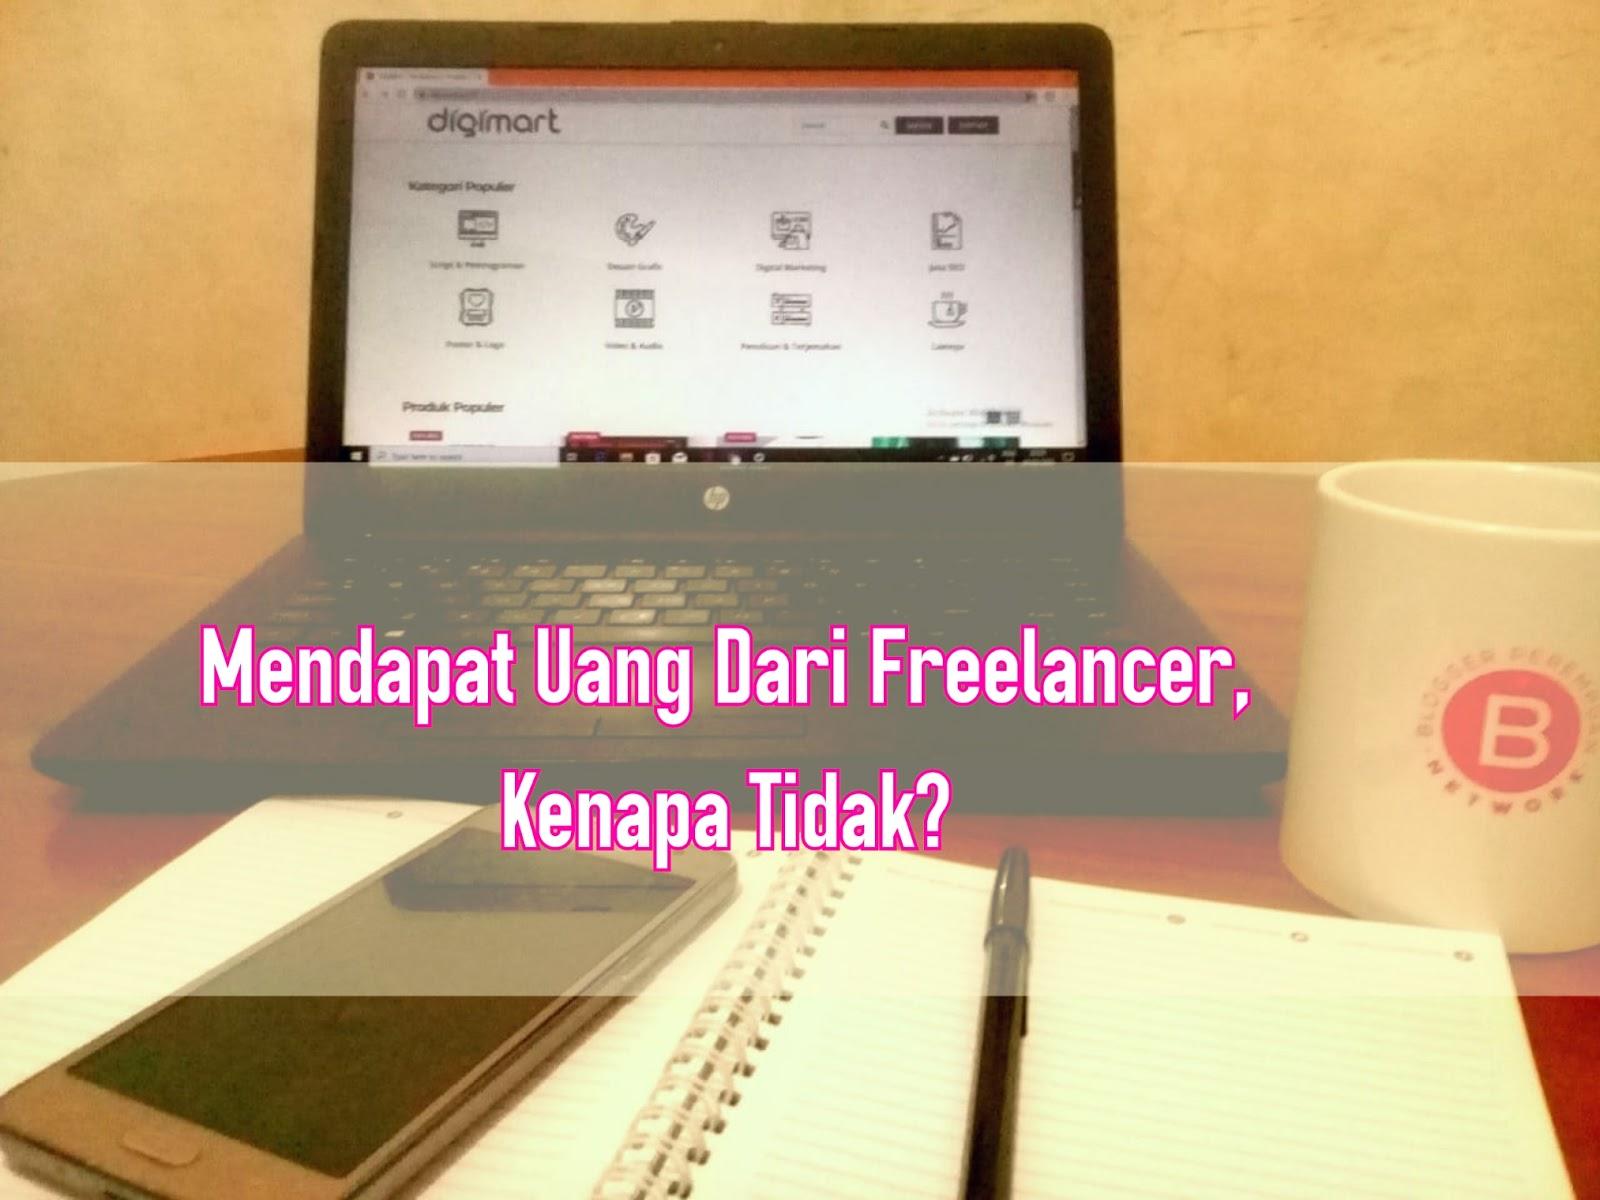 Freelancer adalah, freelance, penulis lepas